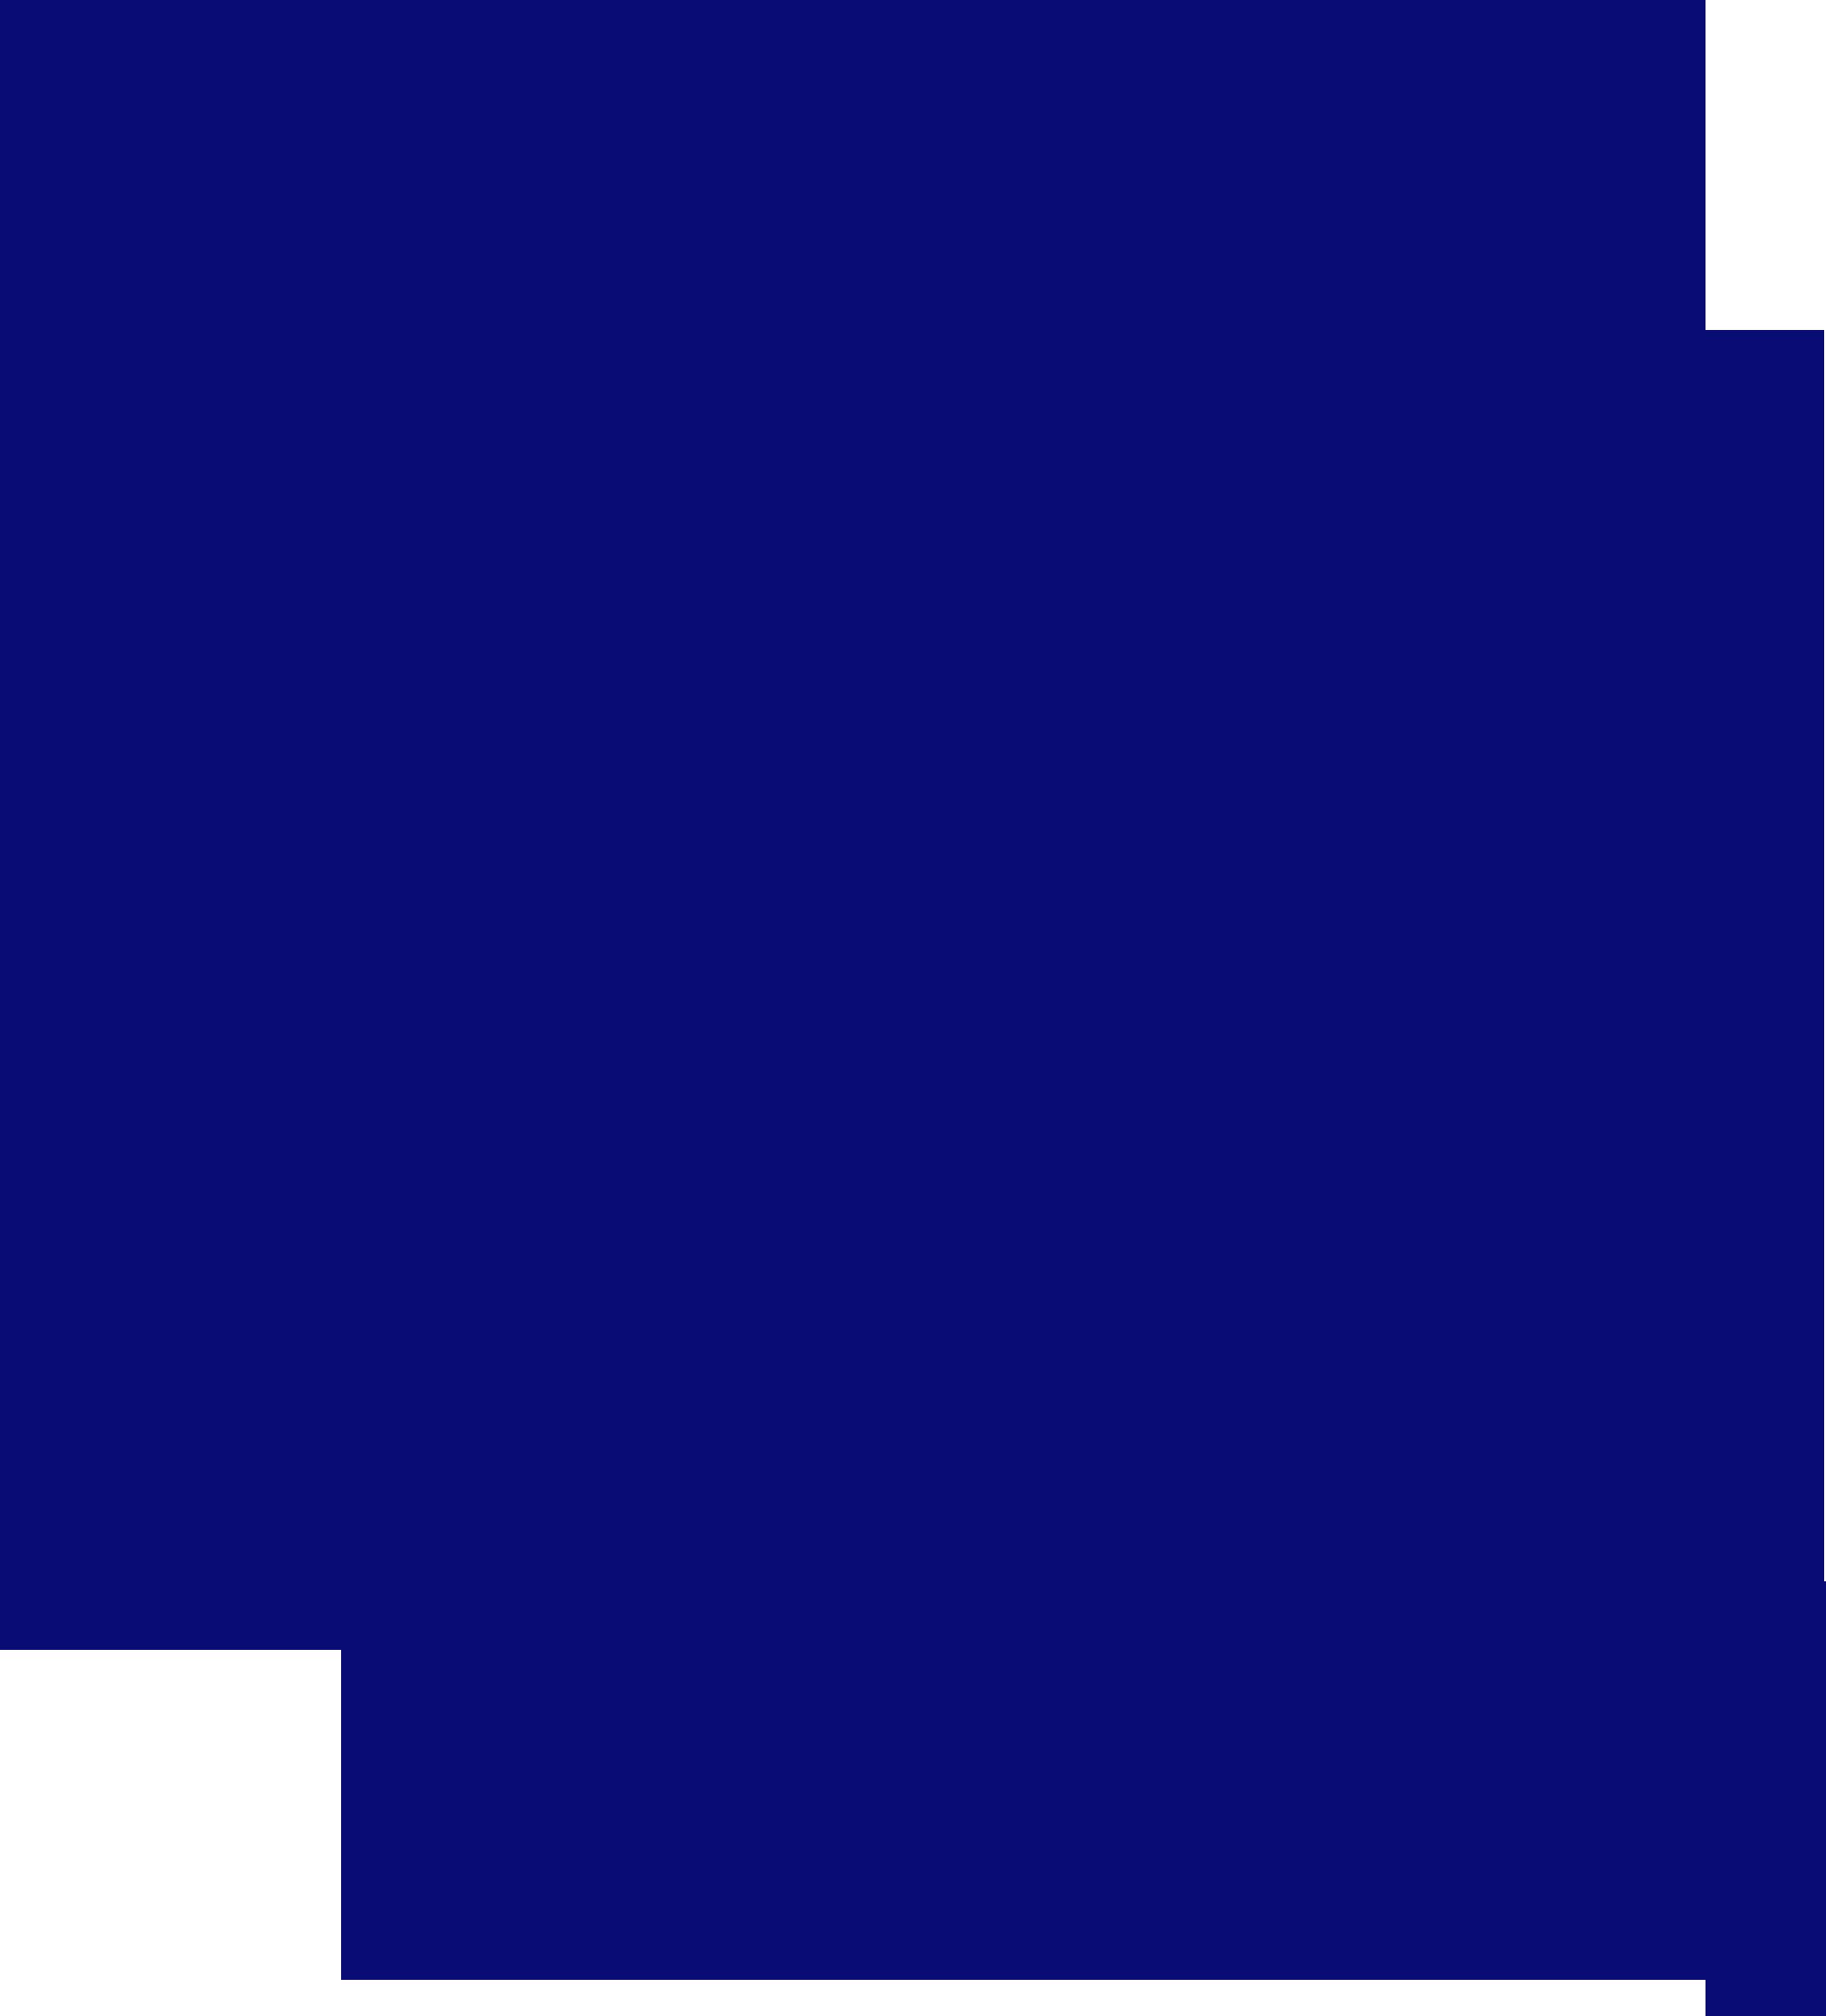 Qalora Capital